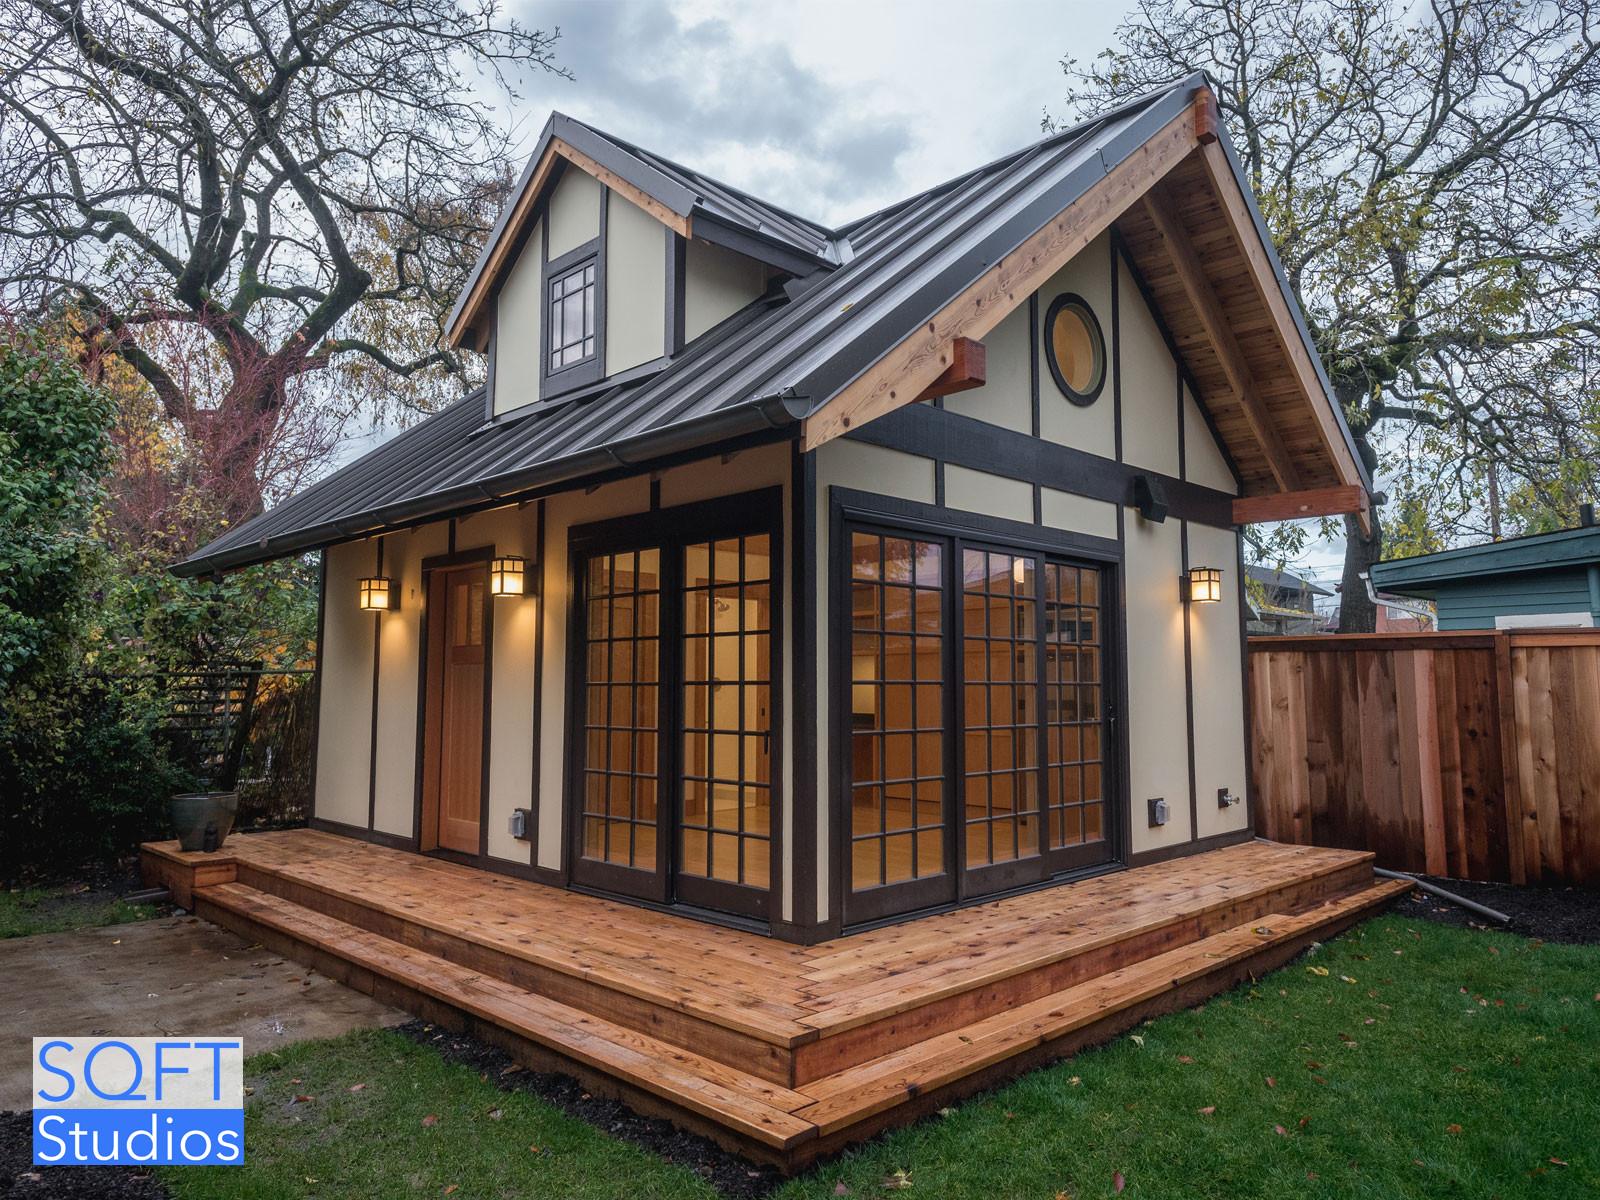 SQFT Studios Design Build ADUs Guest Suites Home